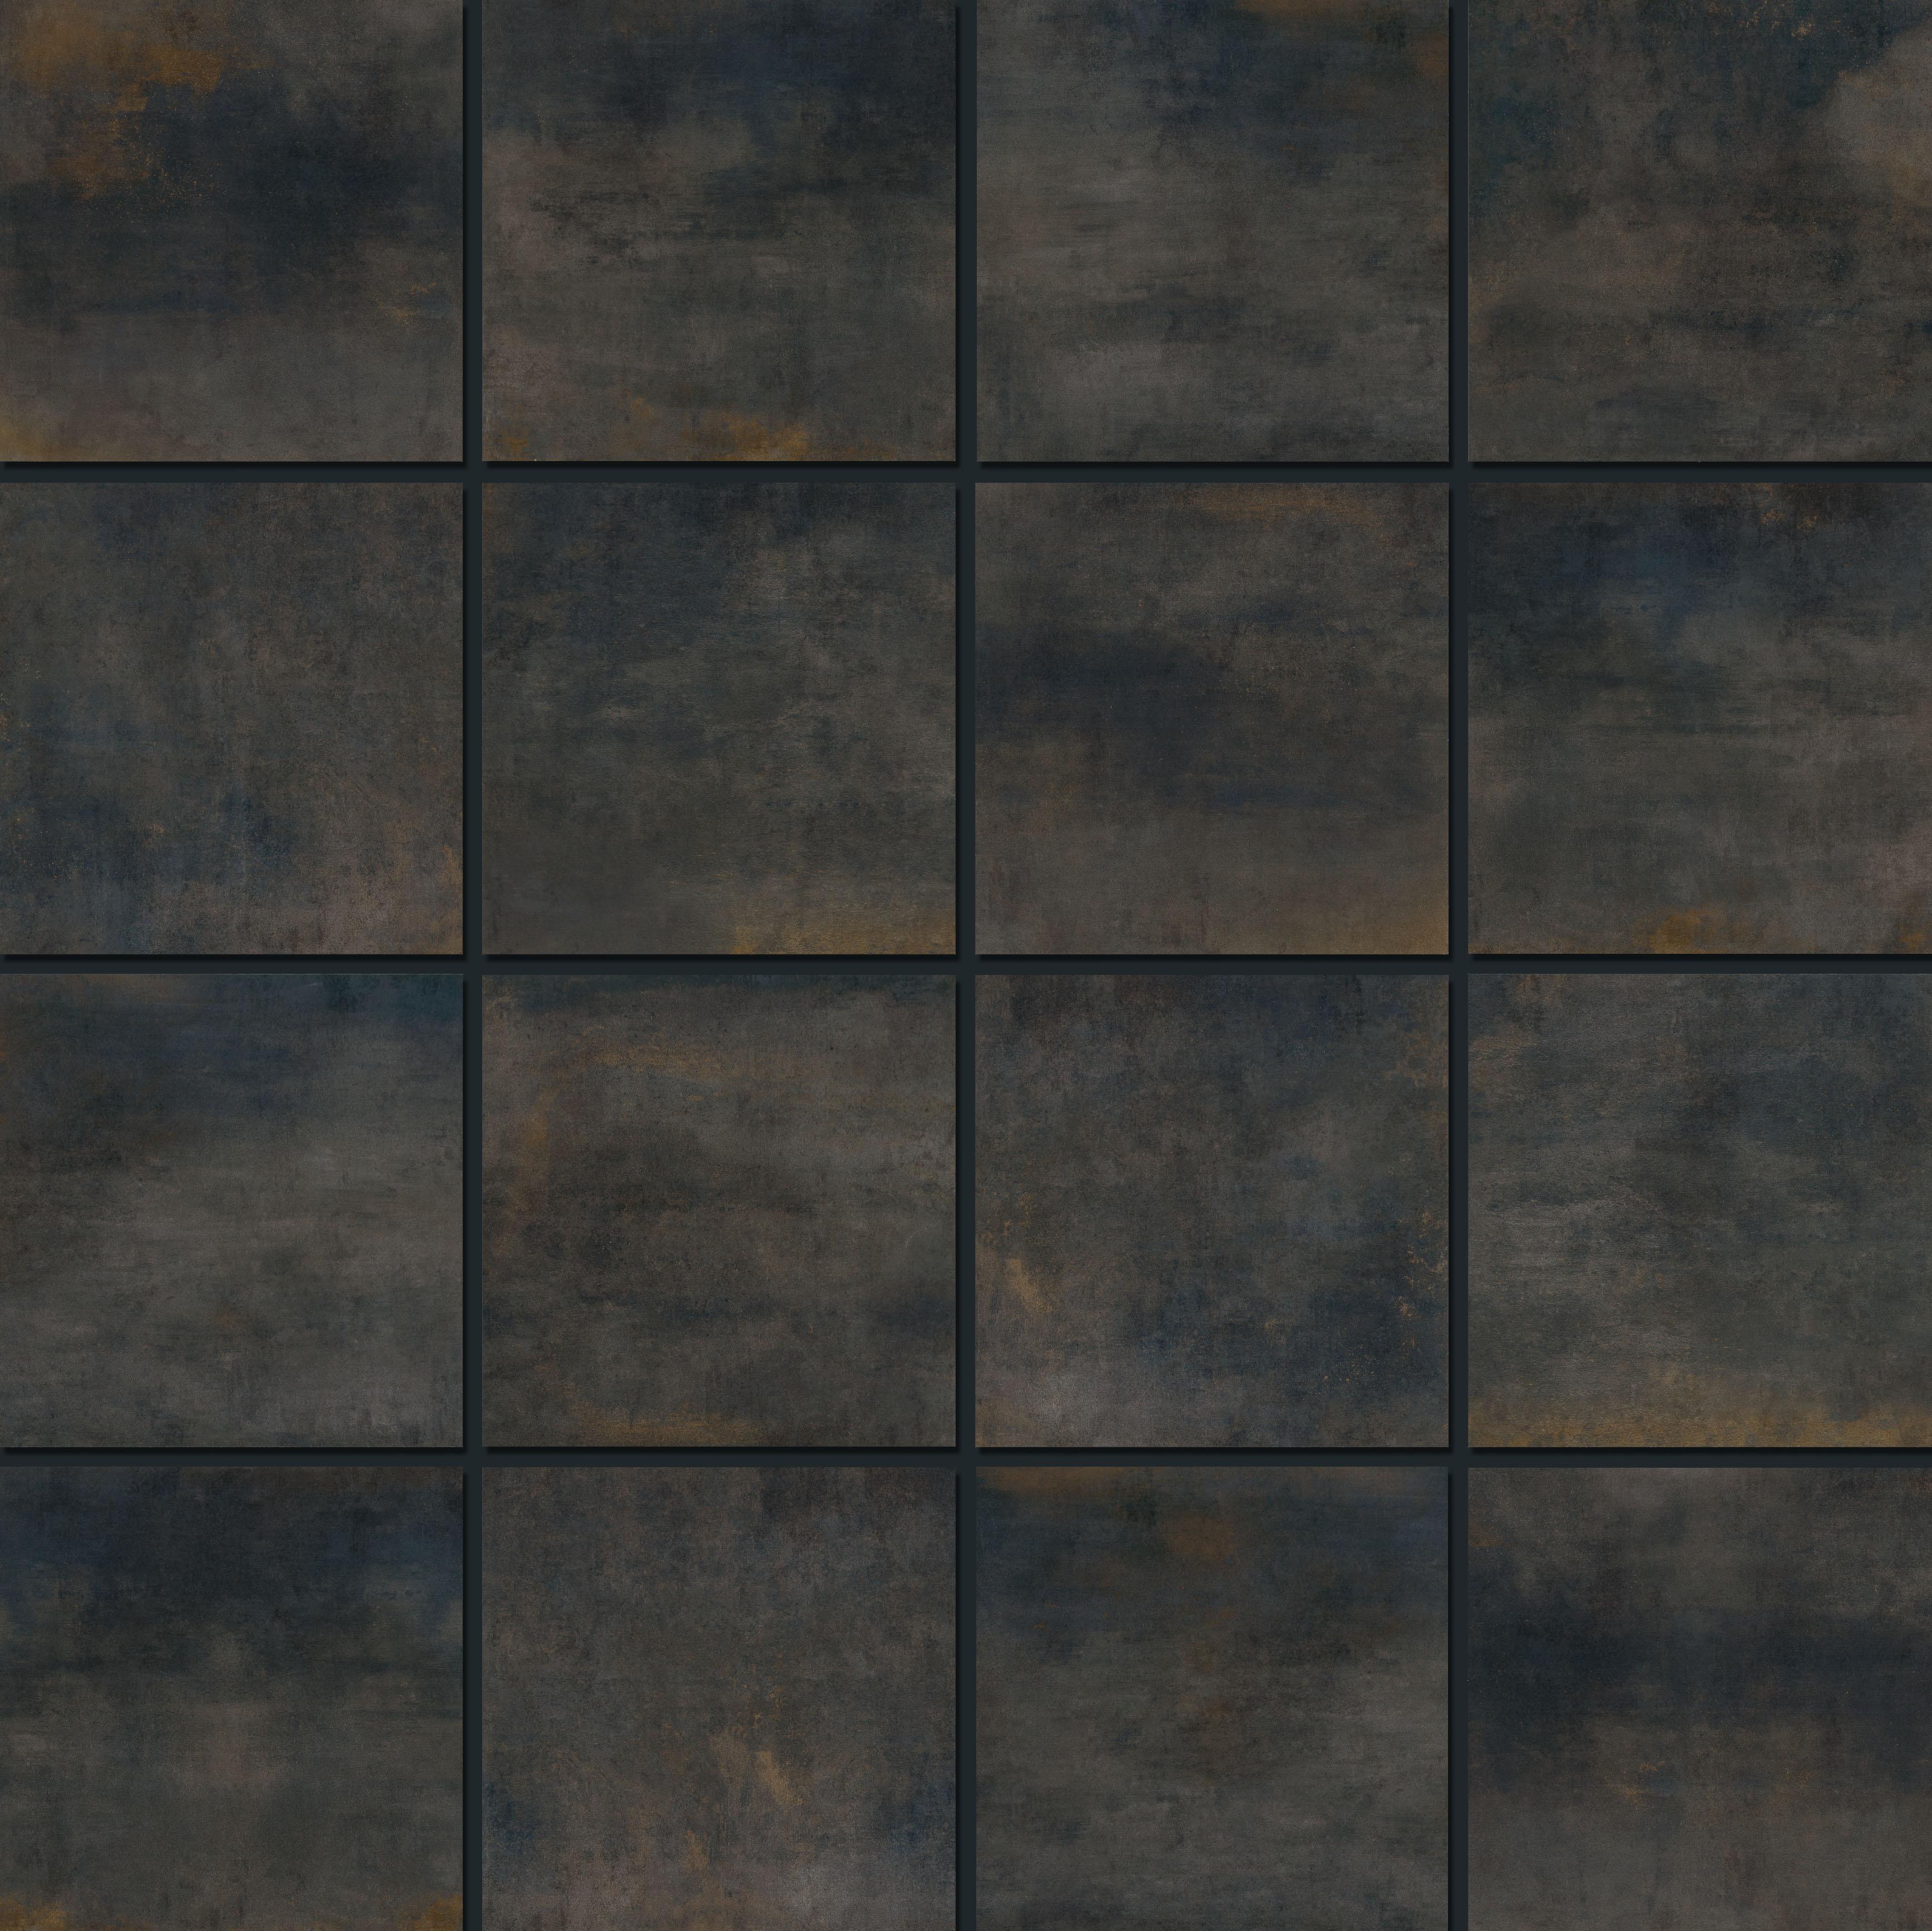 Mosaic 7,2x7,2 Shabby Black